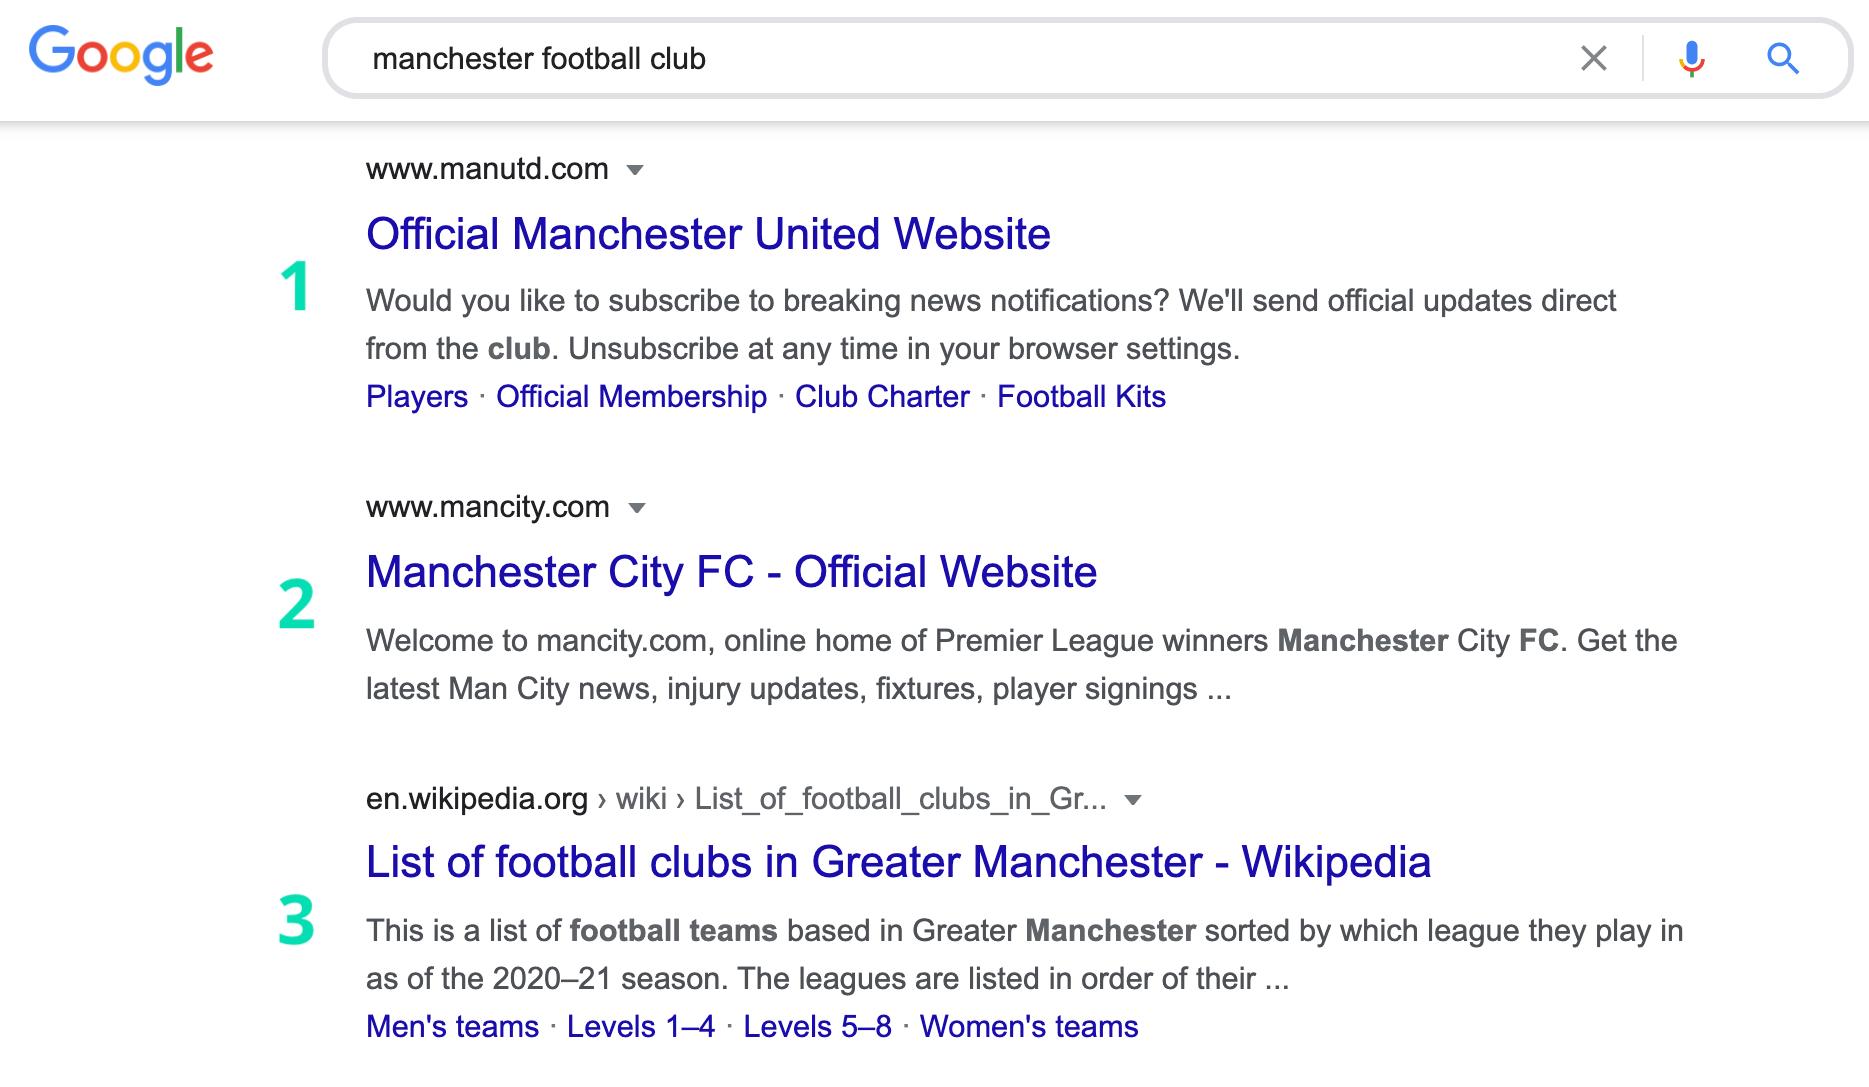 google search manchester football club